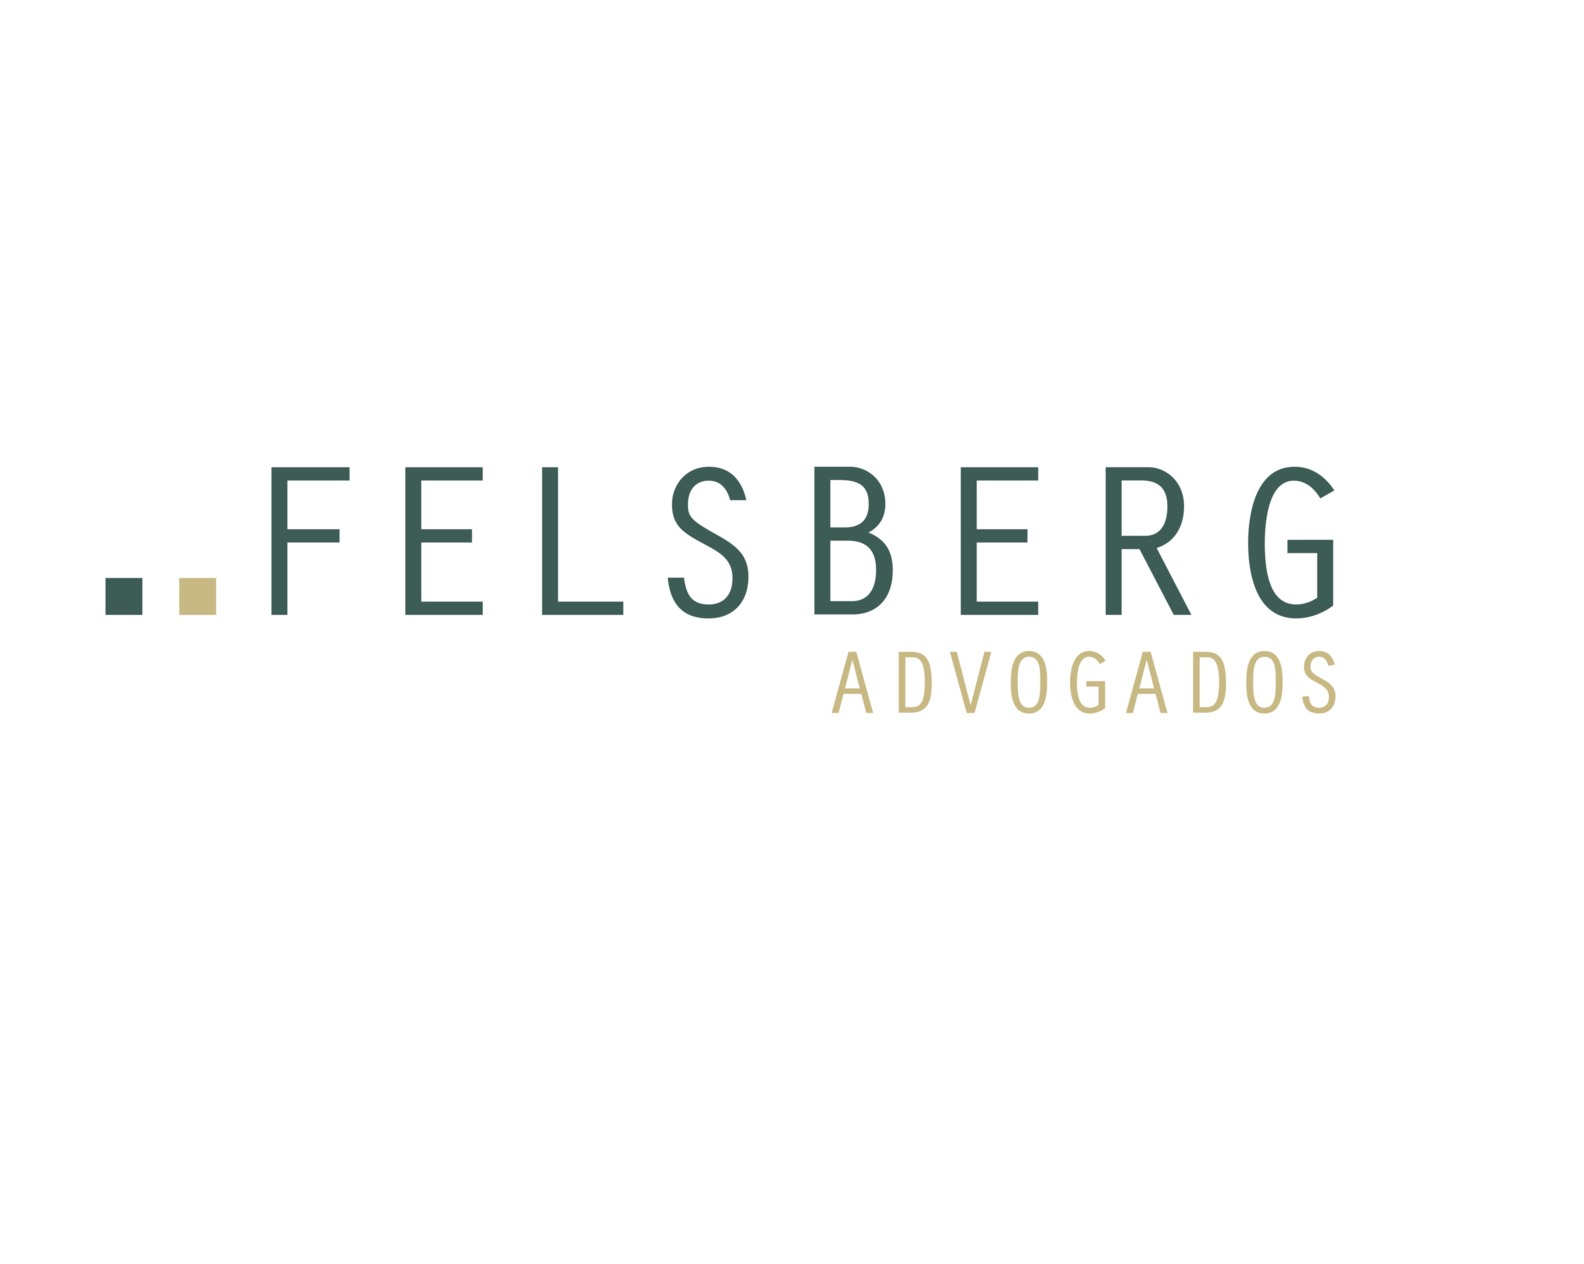 the Felsberg Advogados logo.